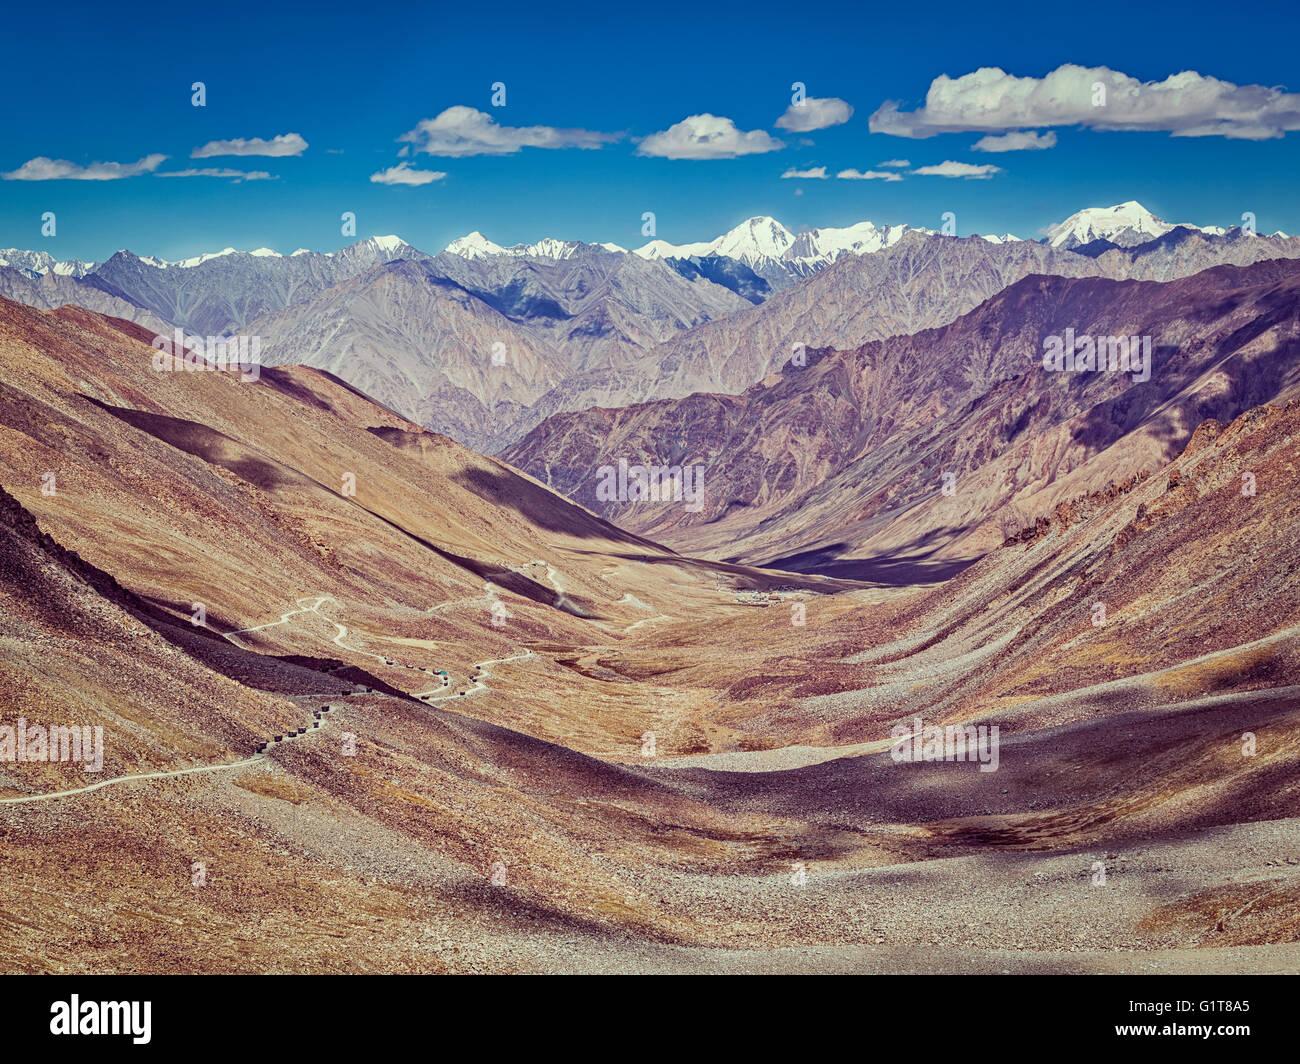 Karakoram Range and road in valley, Ladakh, India - Stock Image